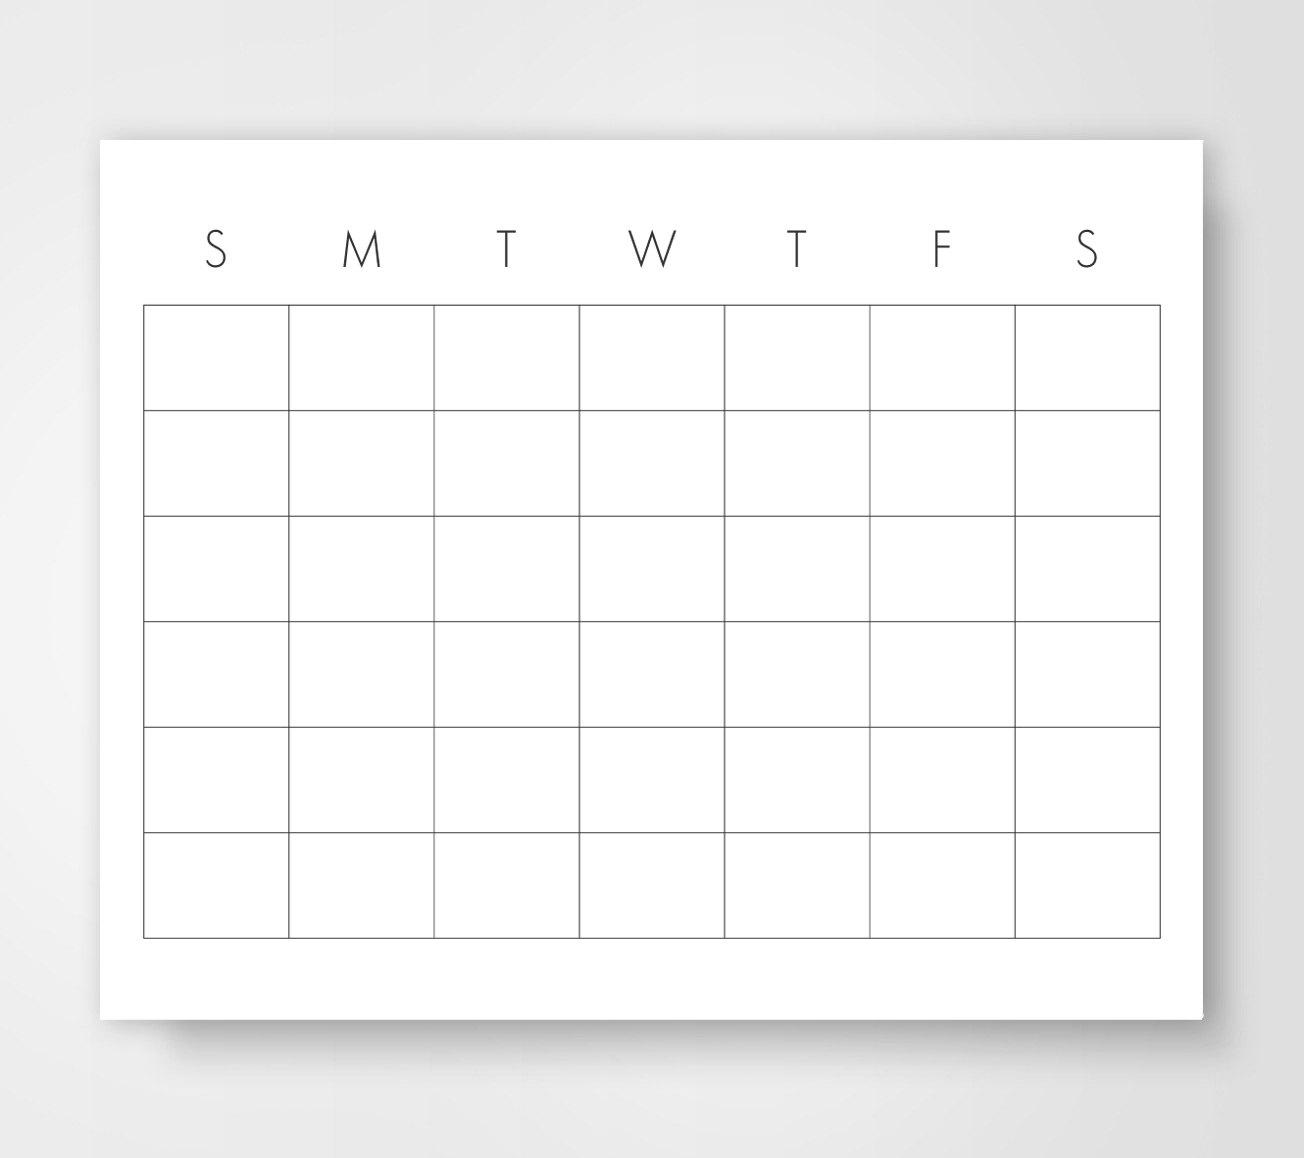 8 X 11 Blank Calendar | 2017 Calendar Printable